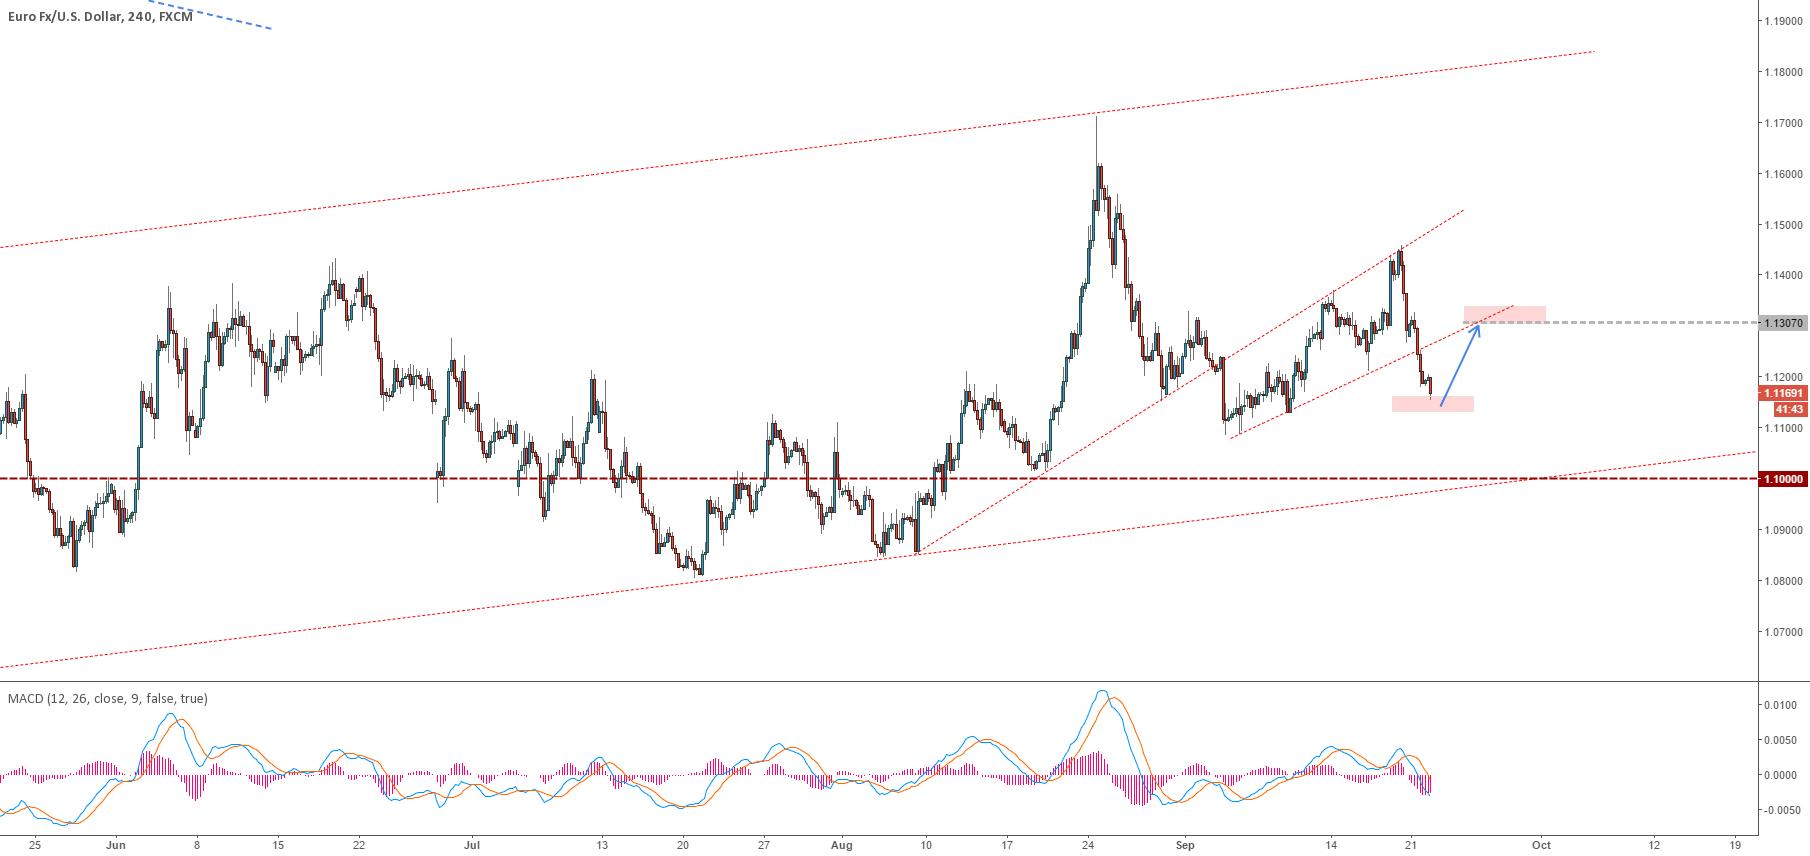 EURUSD - Nobody wants Euros, but...